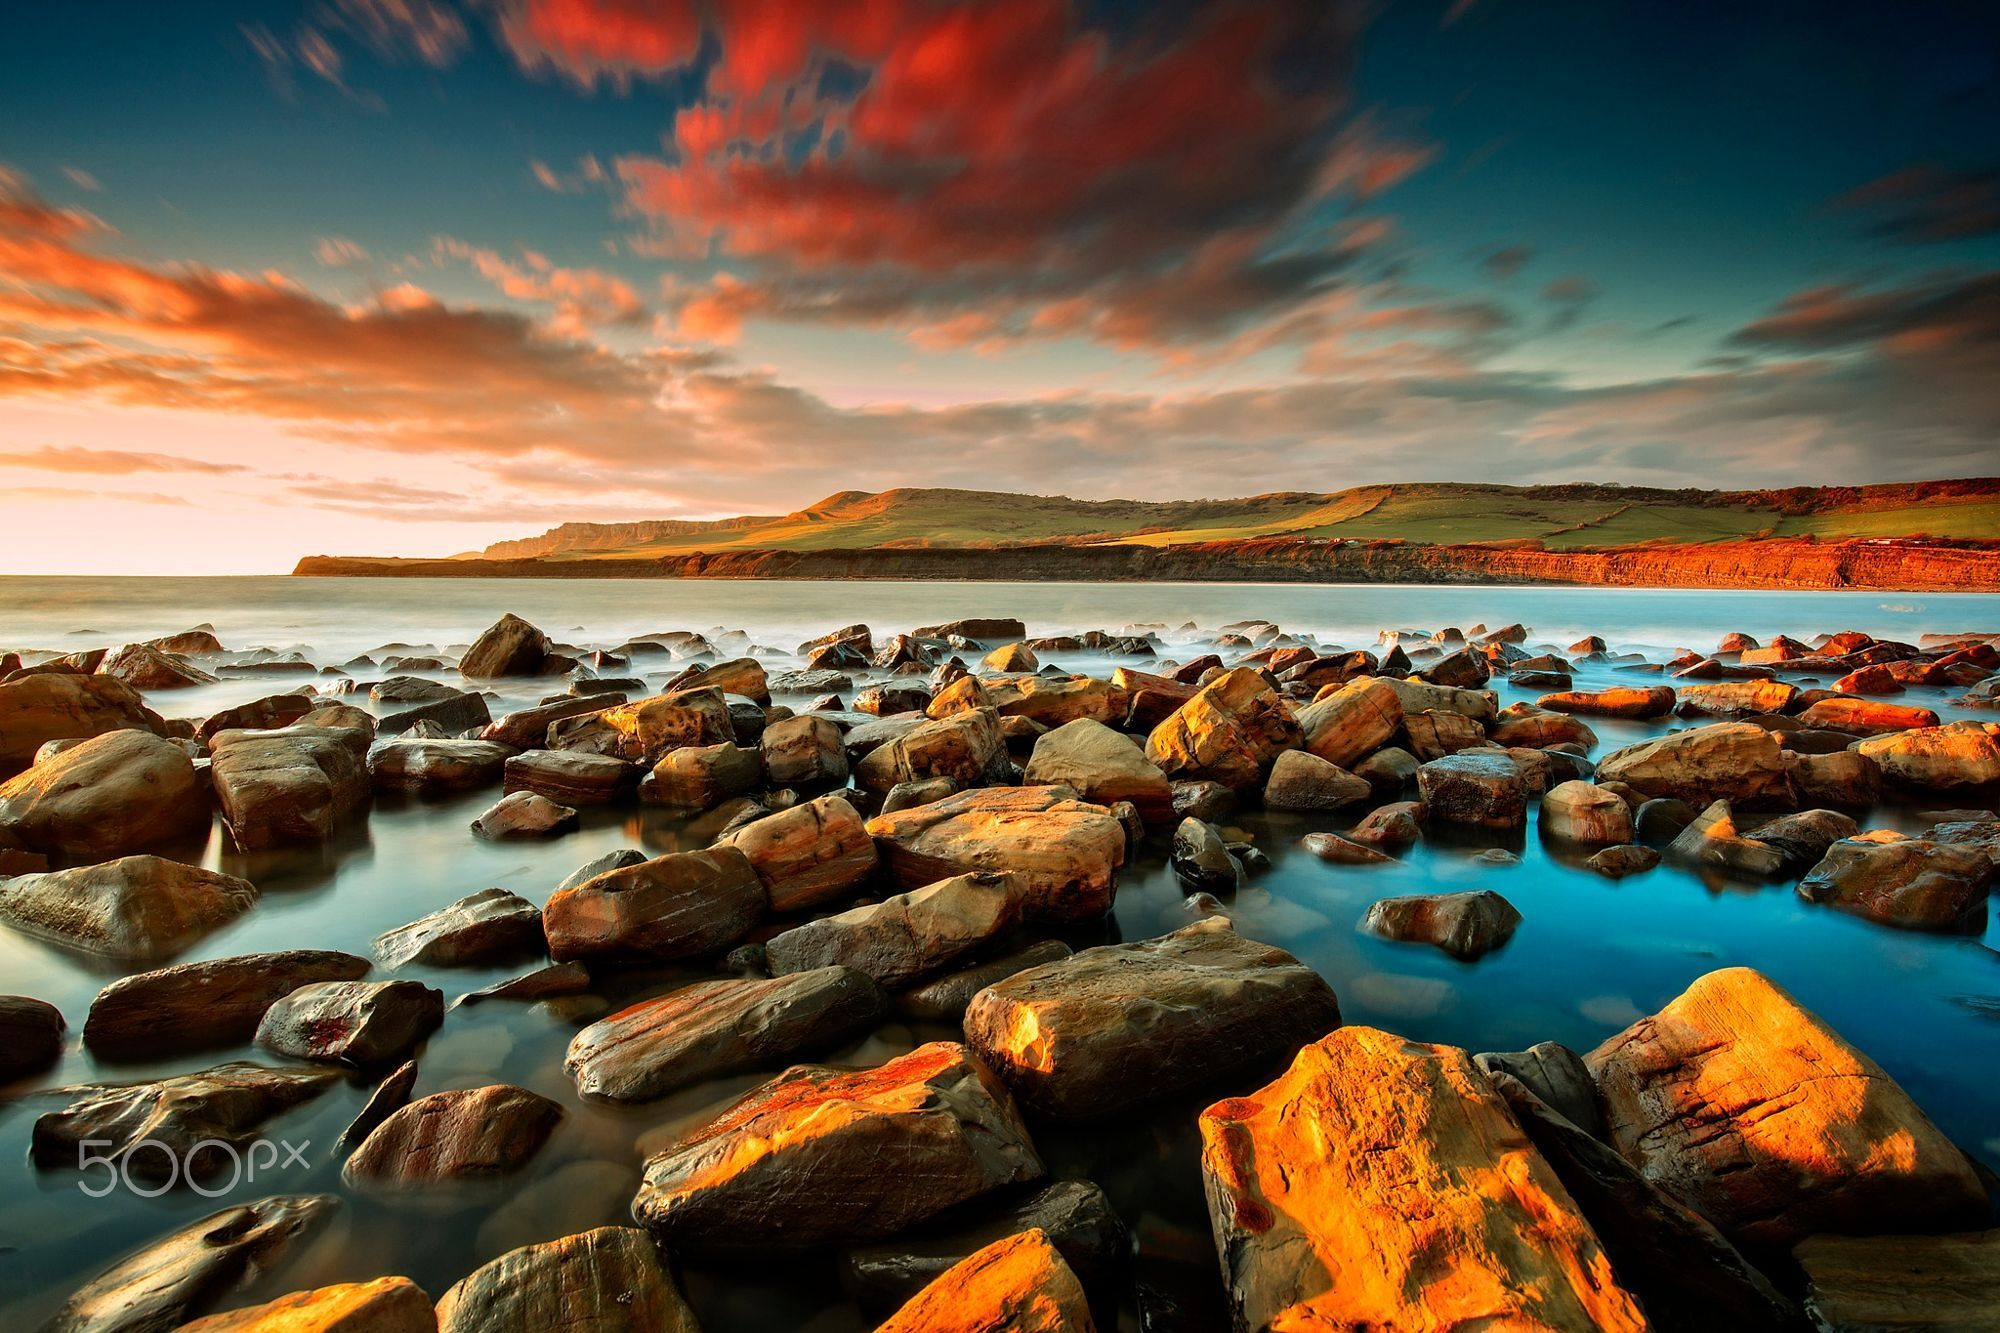 #Photography The Red Rocks Of Kimmeridge by TheNarratographer https://t.co/RoMD6894tU #IFTTT #Nature #Travel https://t.co/tJOC6RjBRW #fol #photography